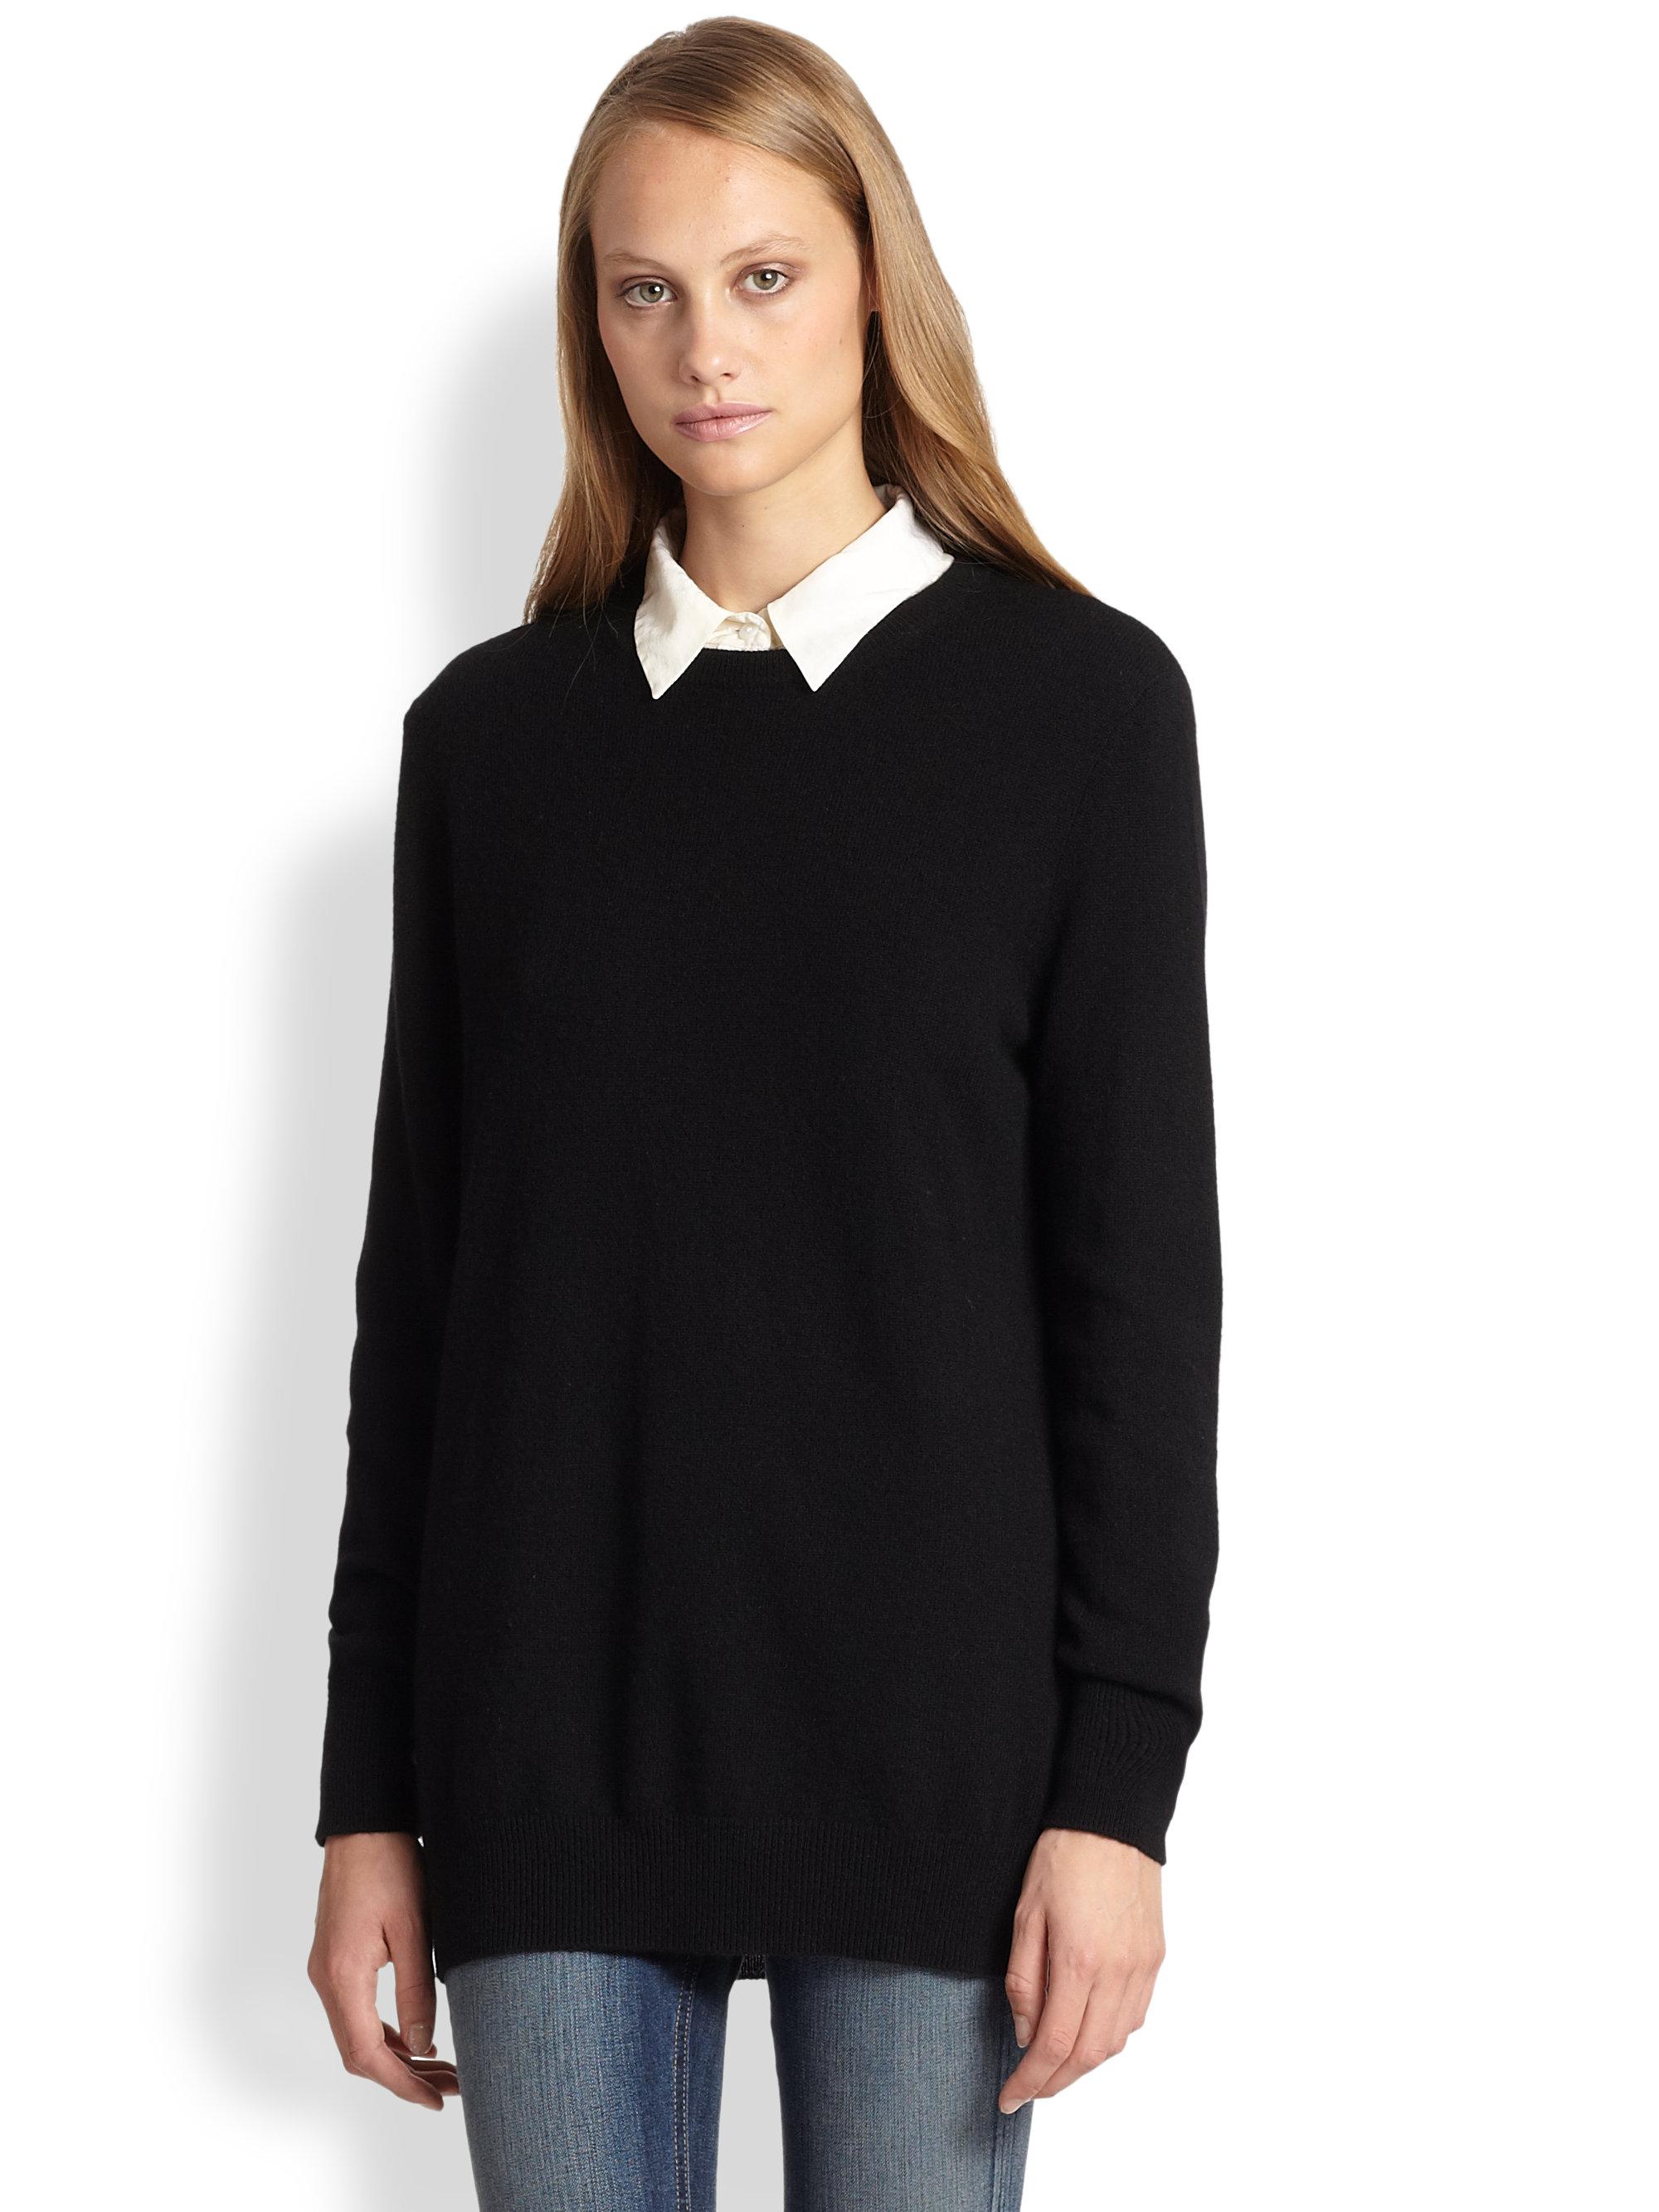 Equipment Rei Cashmere Crewneck Sweater in Black | Lyst